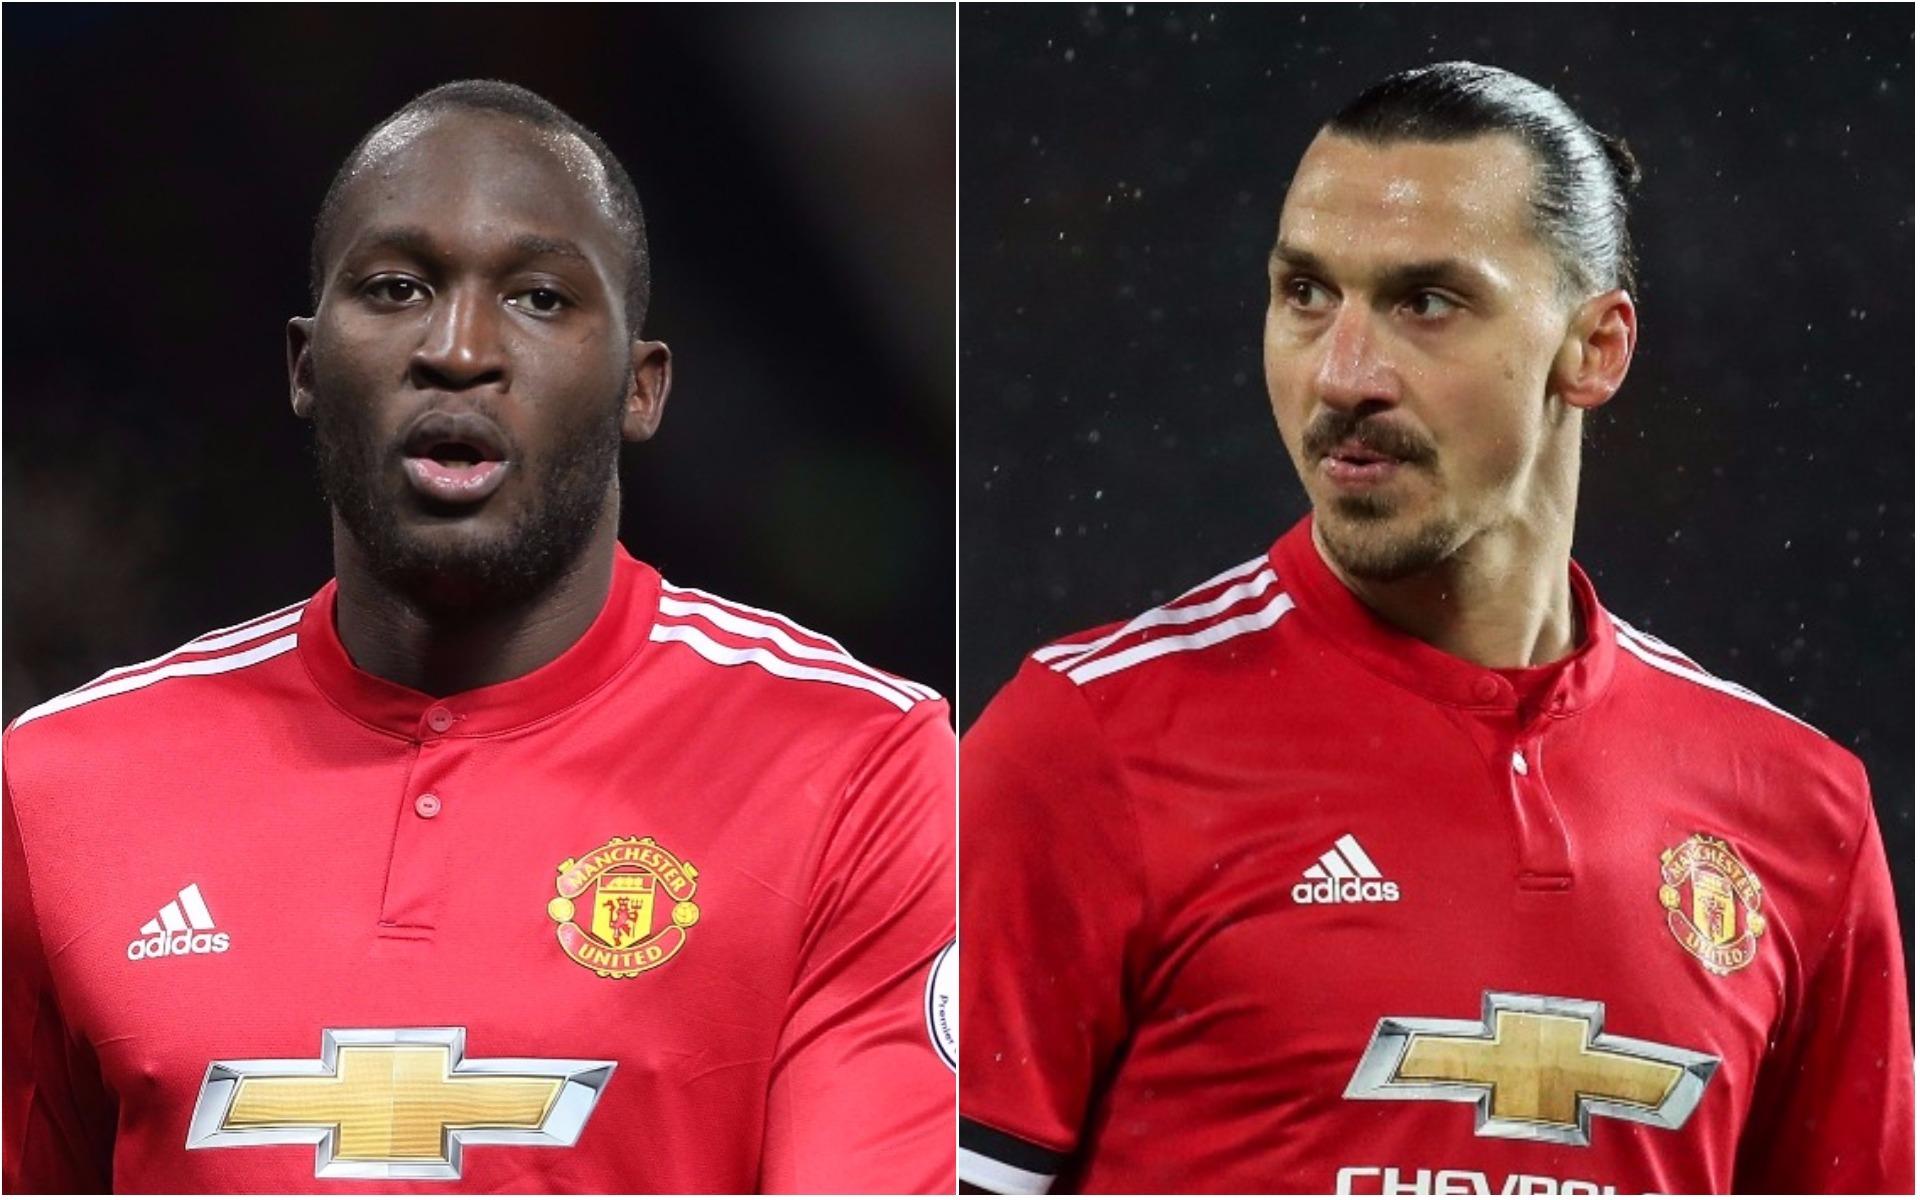 Romelu Lukaku upset with Zlatan Ibrahimovic and Paul Pogba at Manchester United